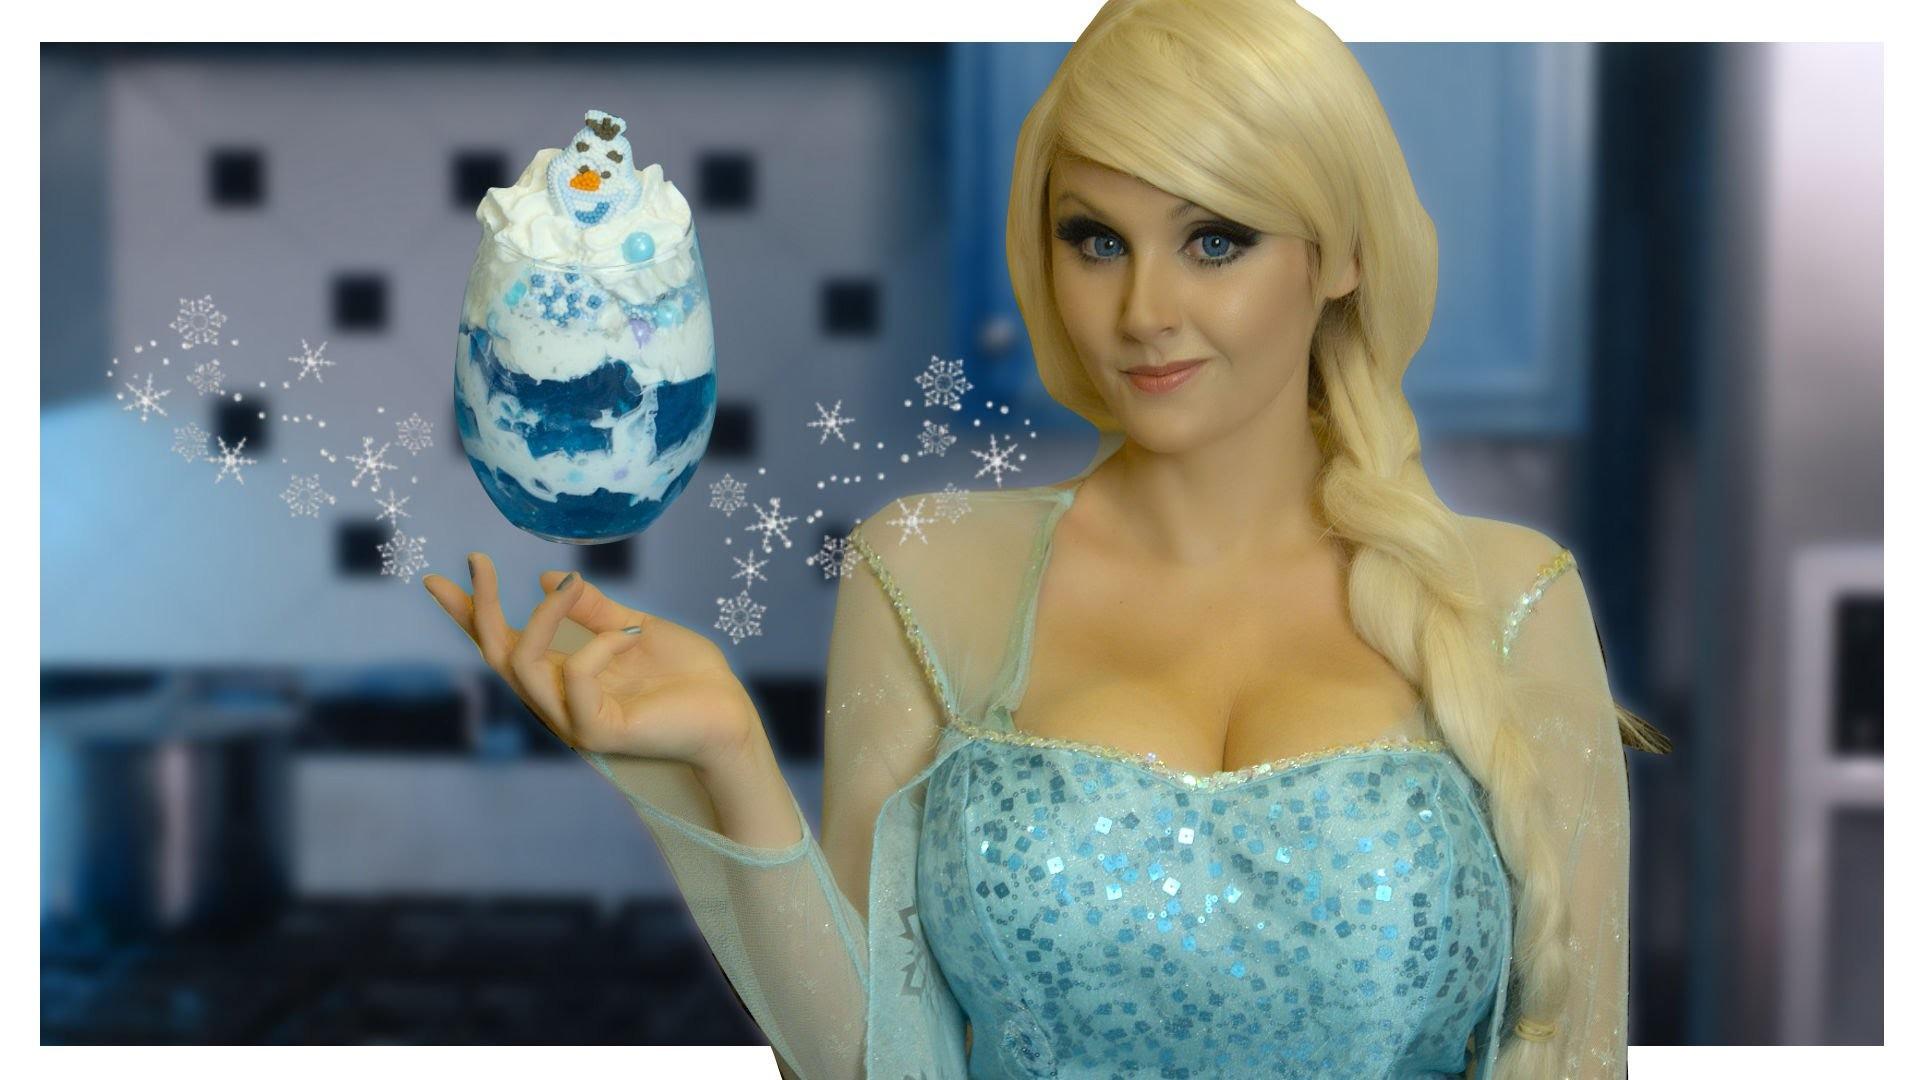 Frozen Elsa Icy Blue Dessert DIY- Elsa Cosplay Kitchen